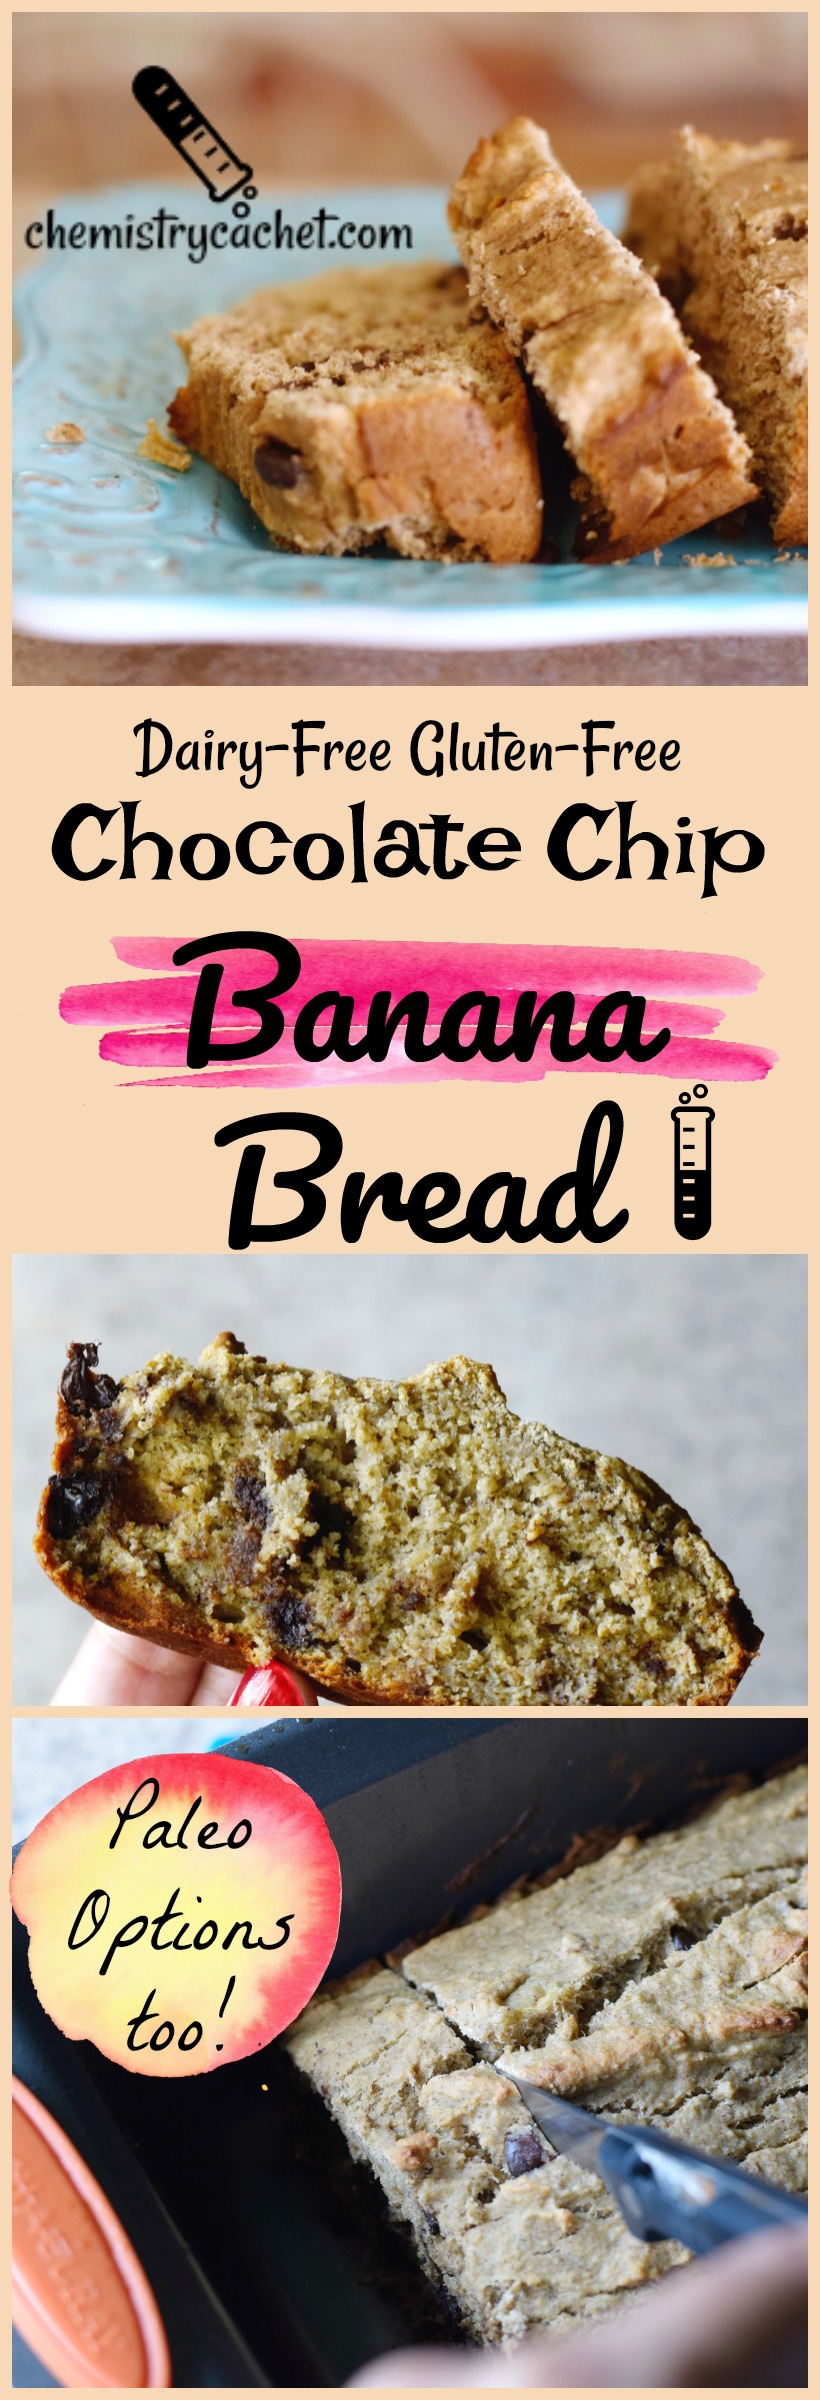 Dairy Free Gluten Free Chocolate Chip Banana Bread